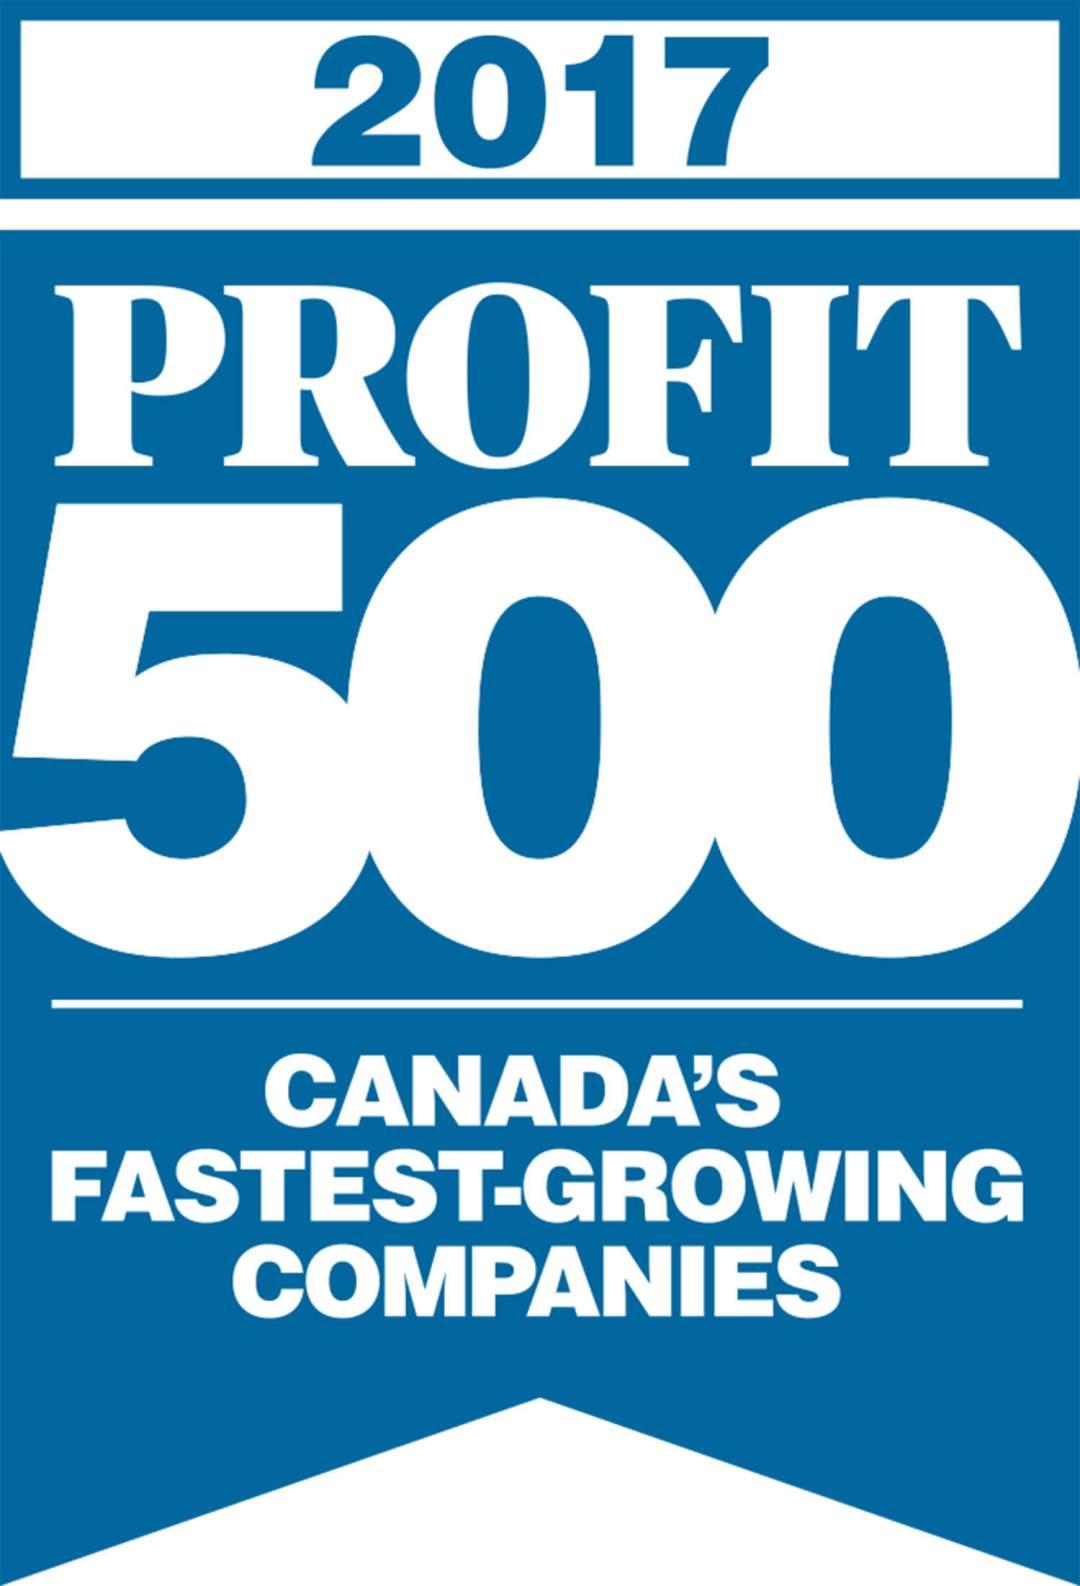 profit 500